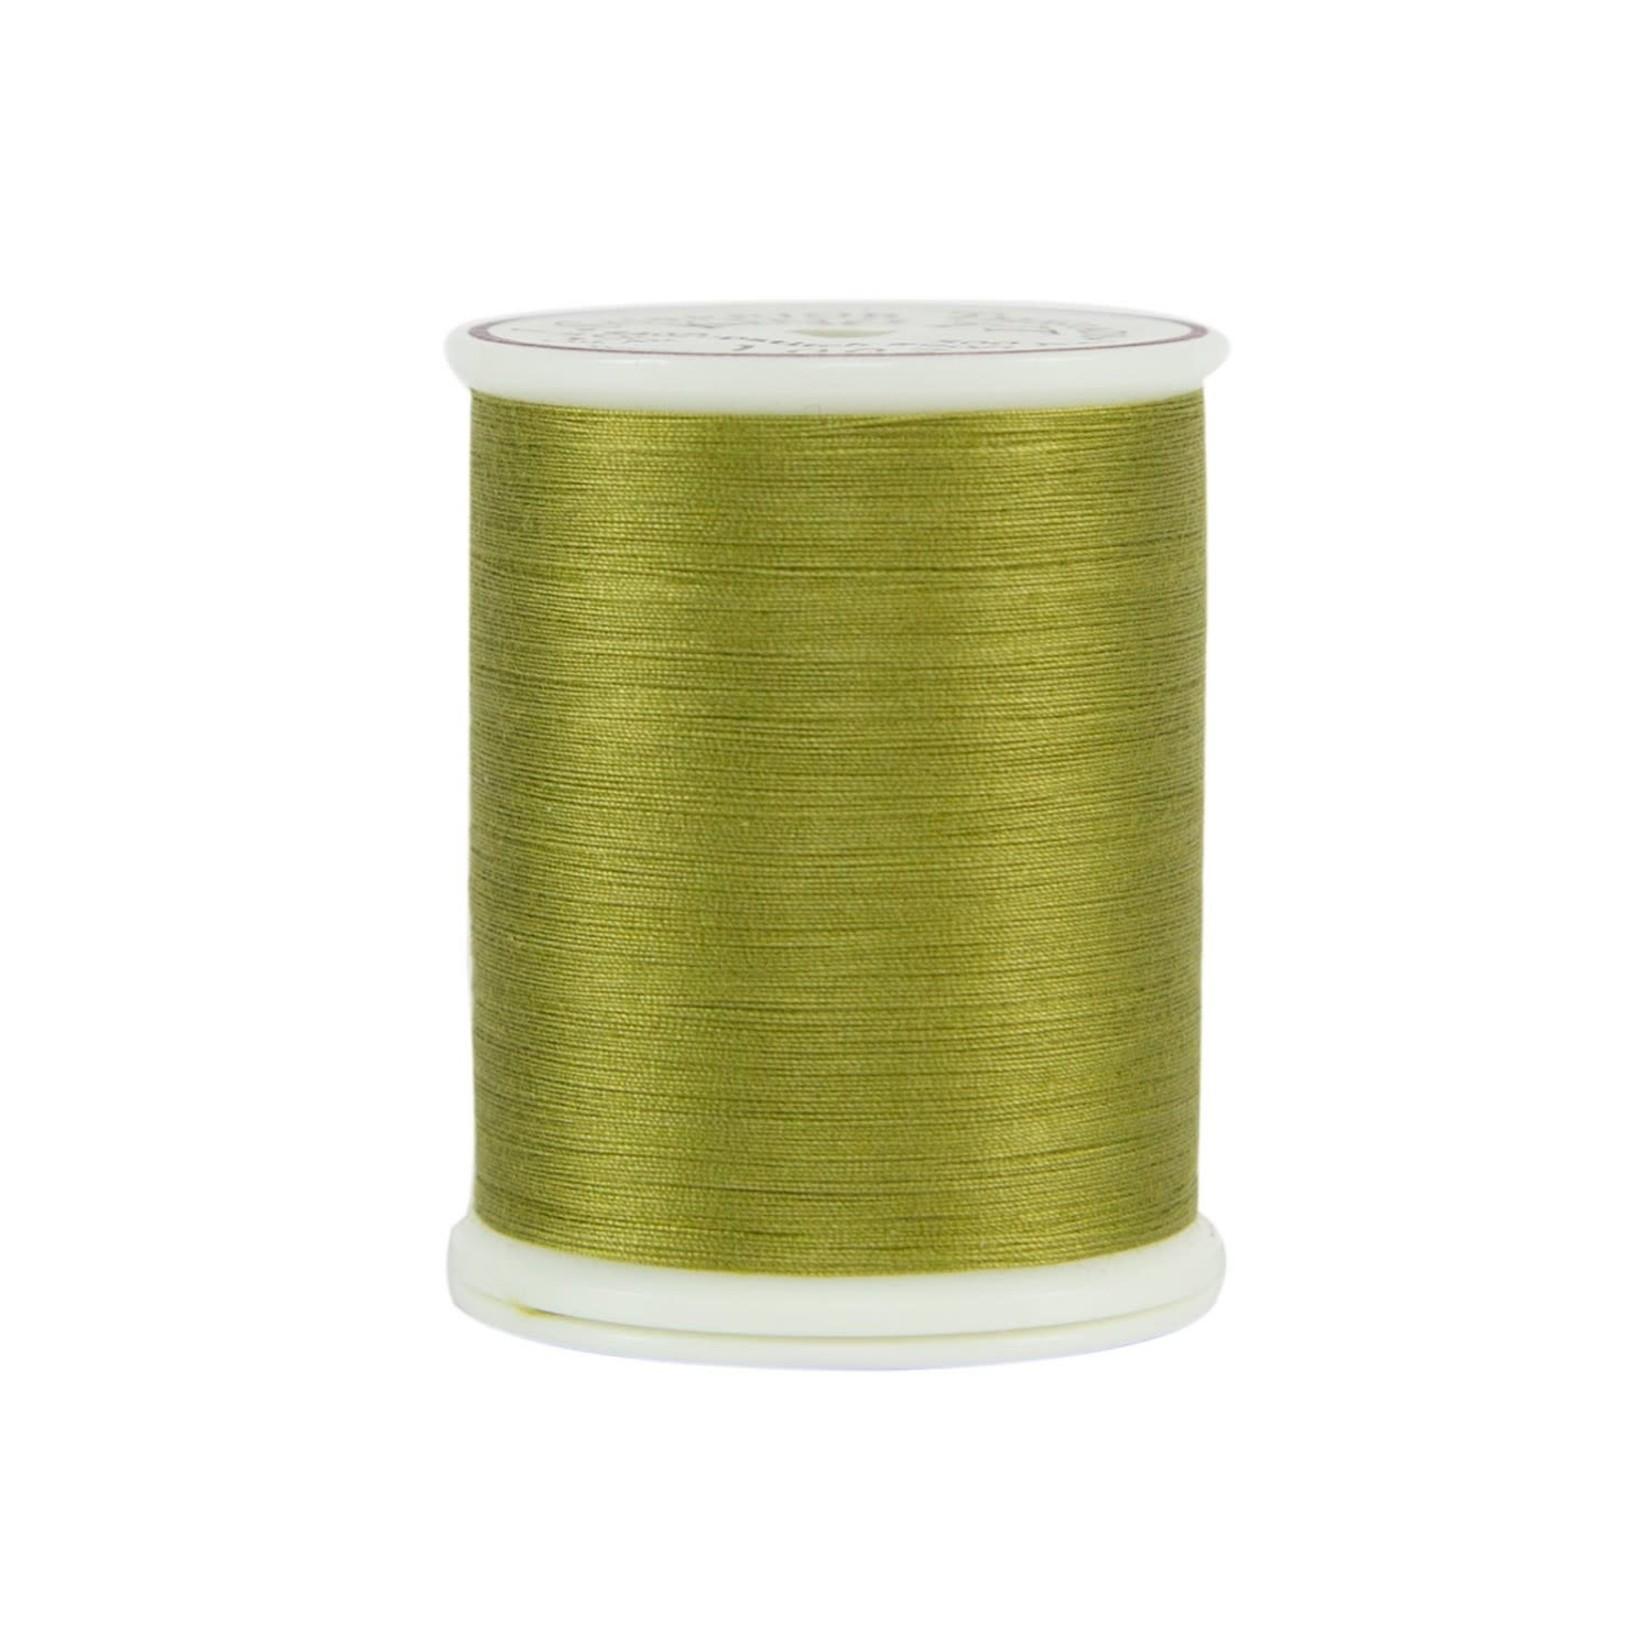 Superior Threads King Tut - #40 - 457 m - 1007 Olive Branch